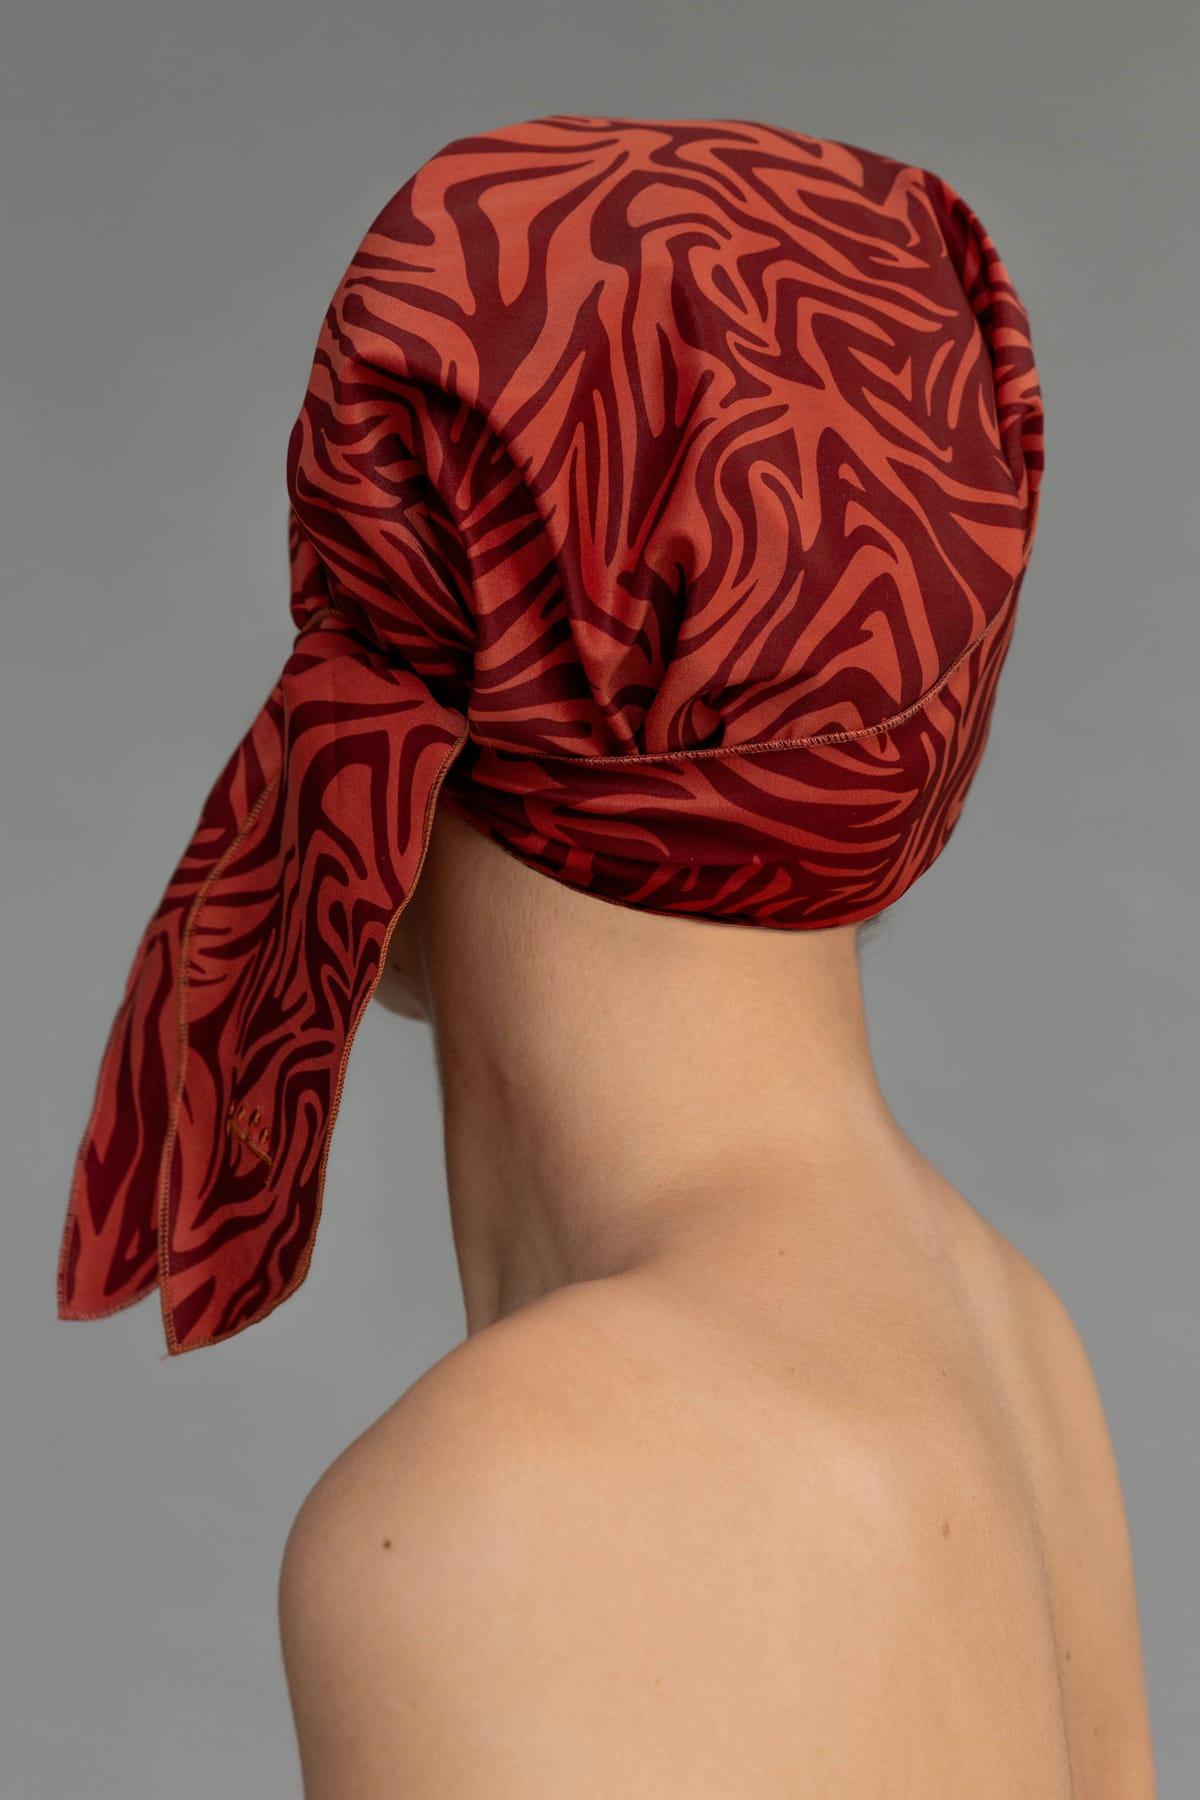 Gorro de ducha elegante estampado tonos rojos